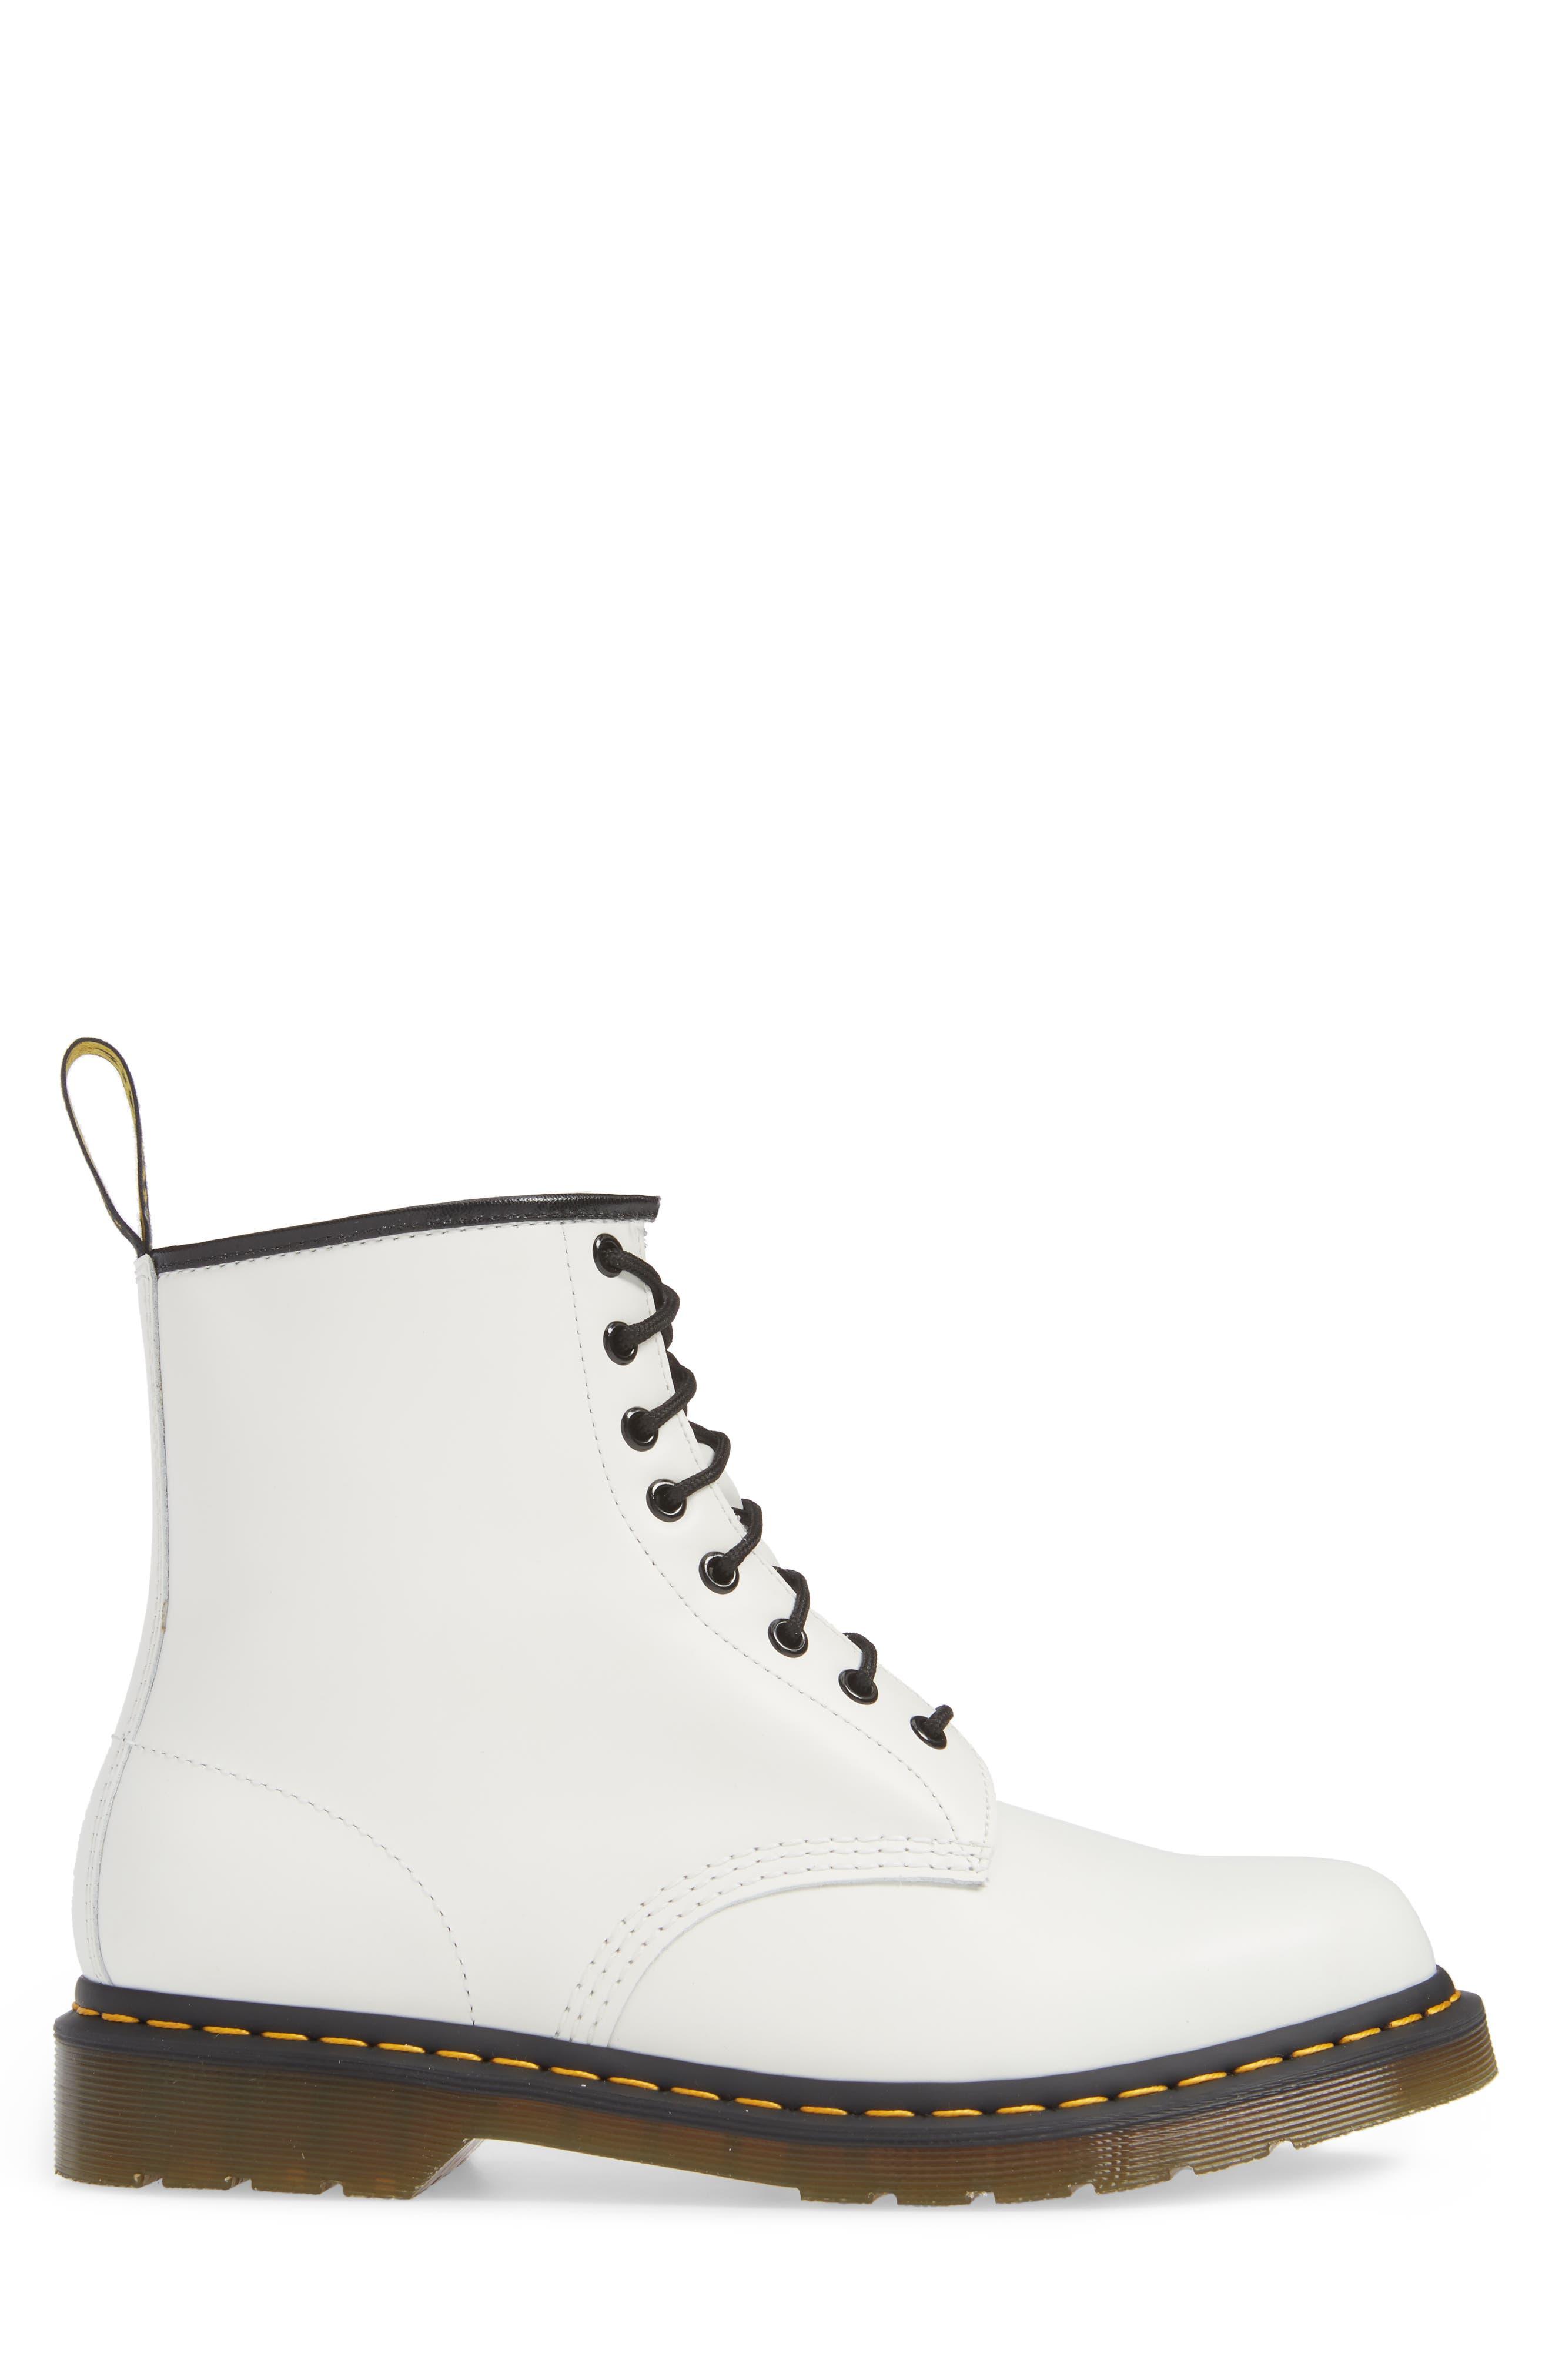 DR. MARTENS, '1460' Boot, Alternate thumbnail 3, color, WHITE